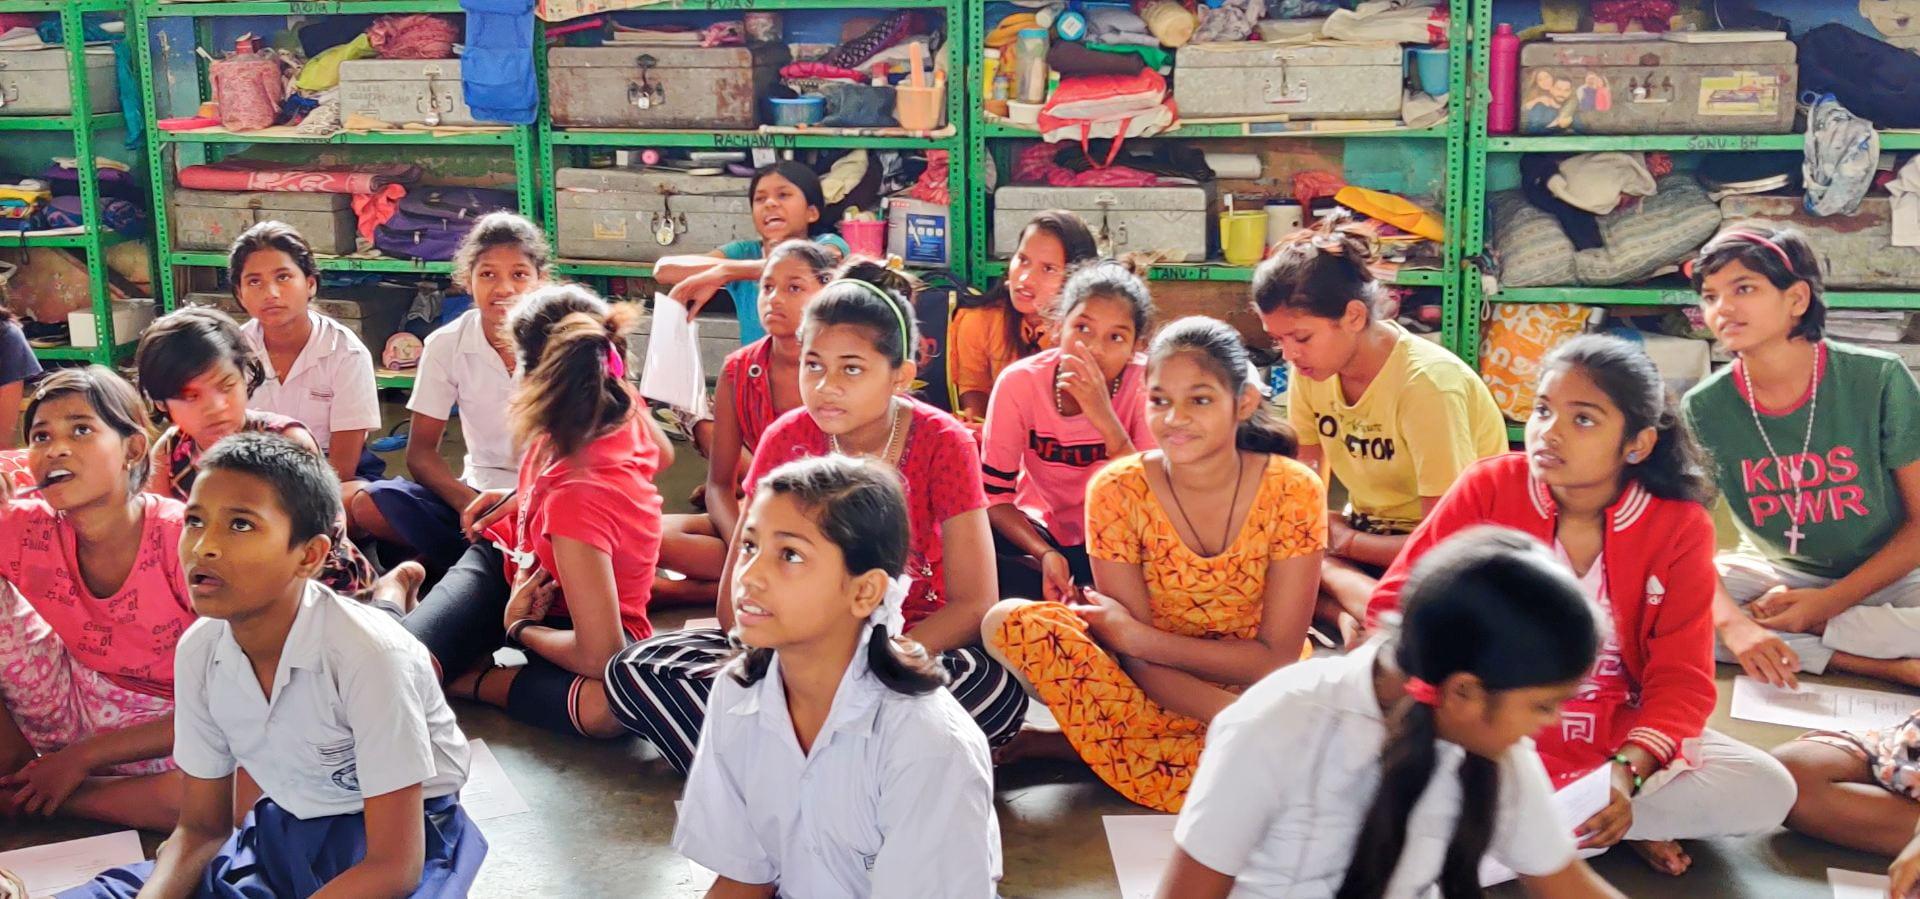 Children sitting cross-legged on the classroom floor, listening